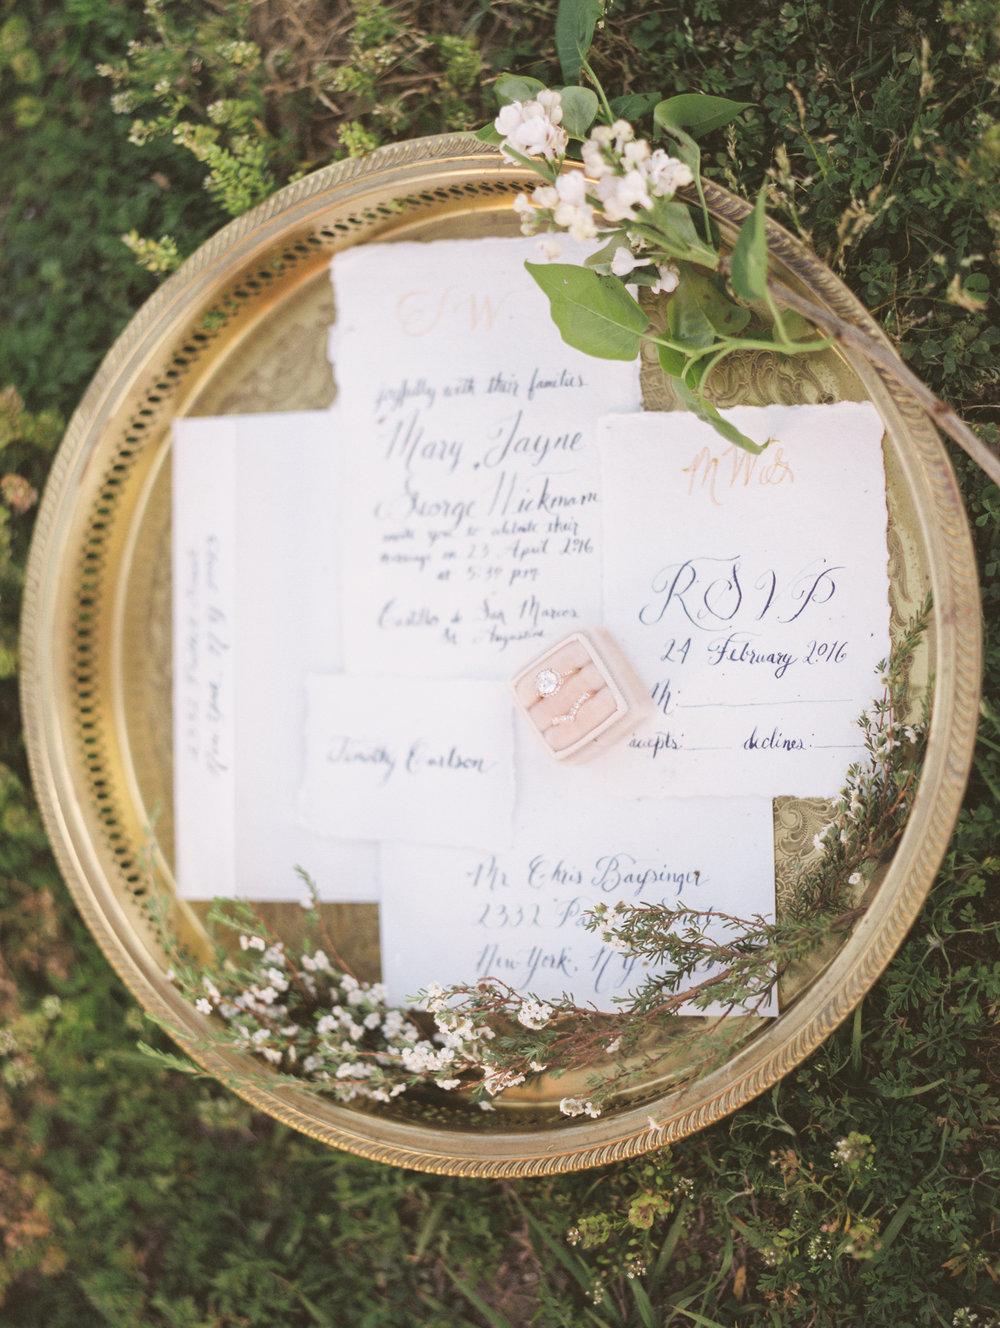 St. augustine, castillo de san marcos styled wedding bridal photo, invitation details